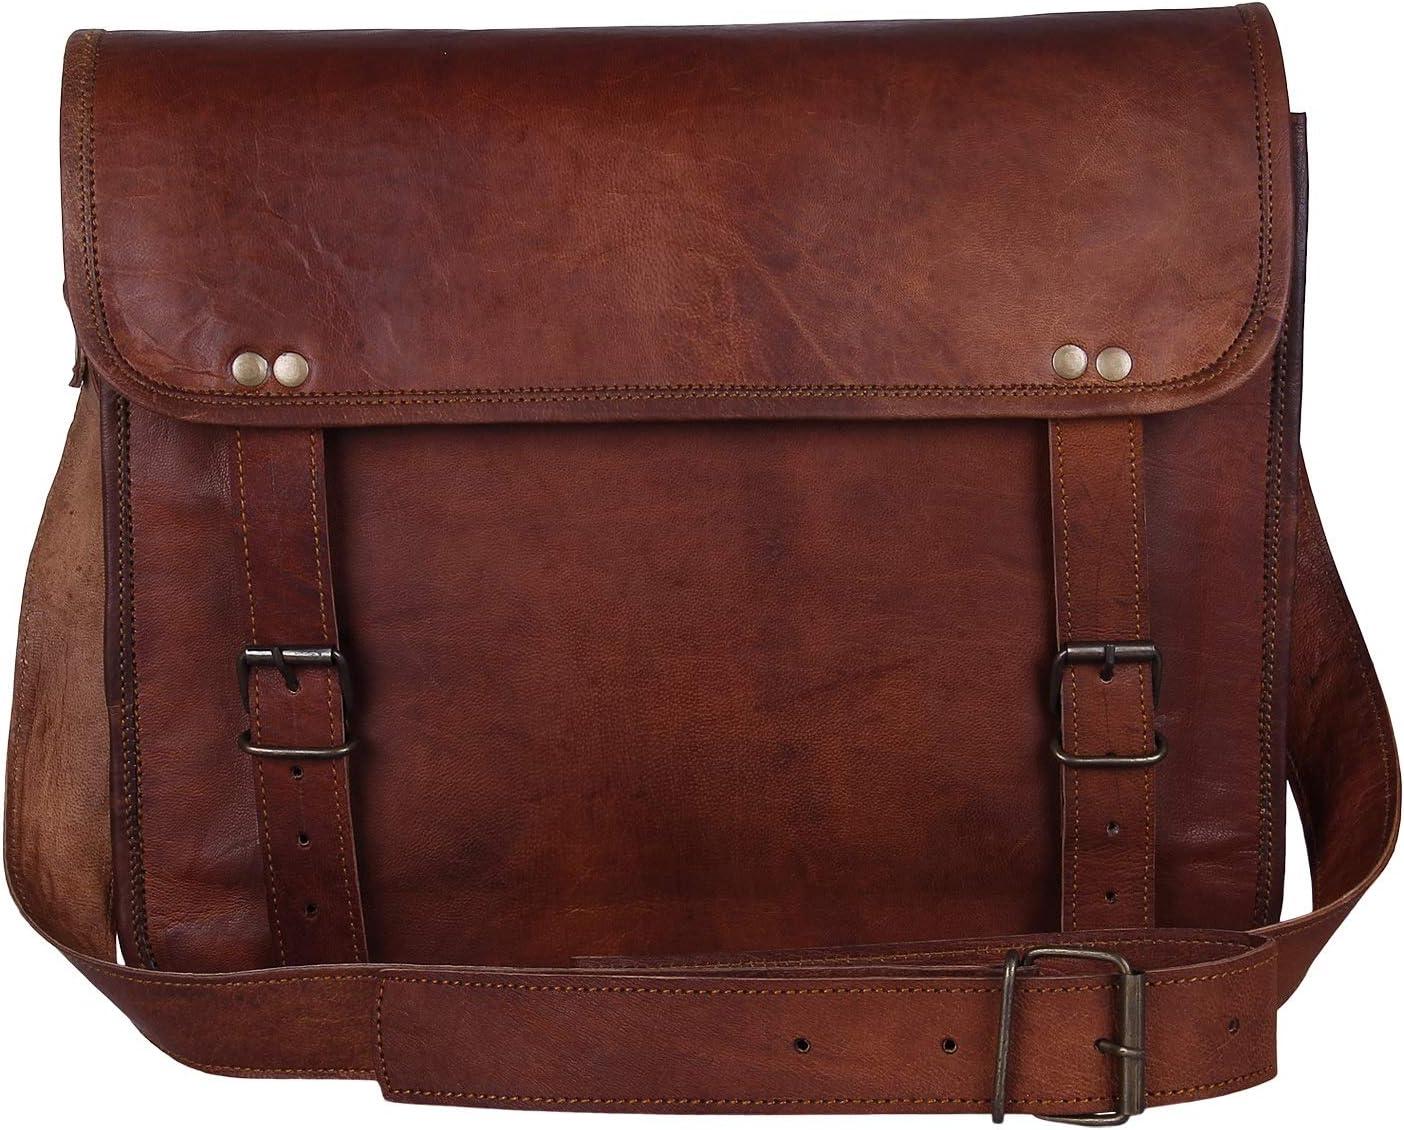 "Rustic Town 15"" Genuine Leather Handmade Crossbody Messenger Satchel Laptop Bag"